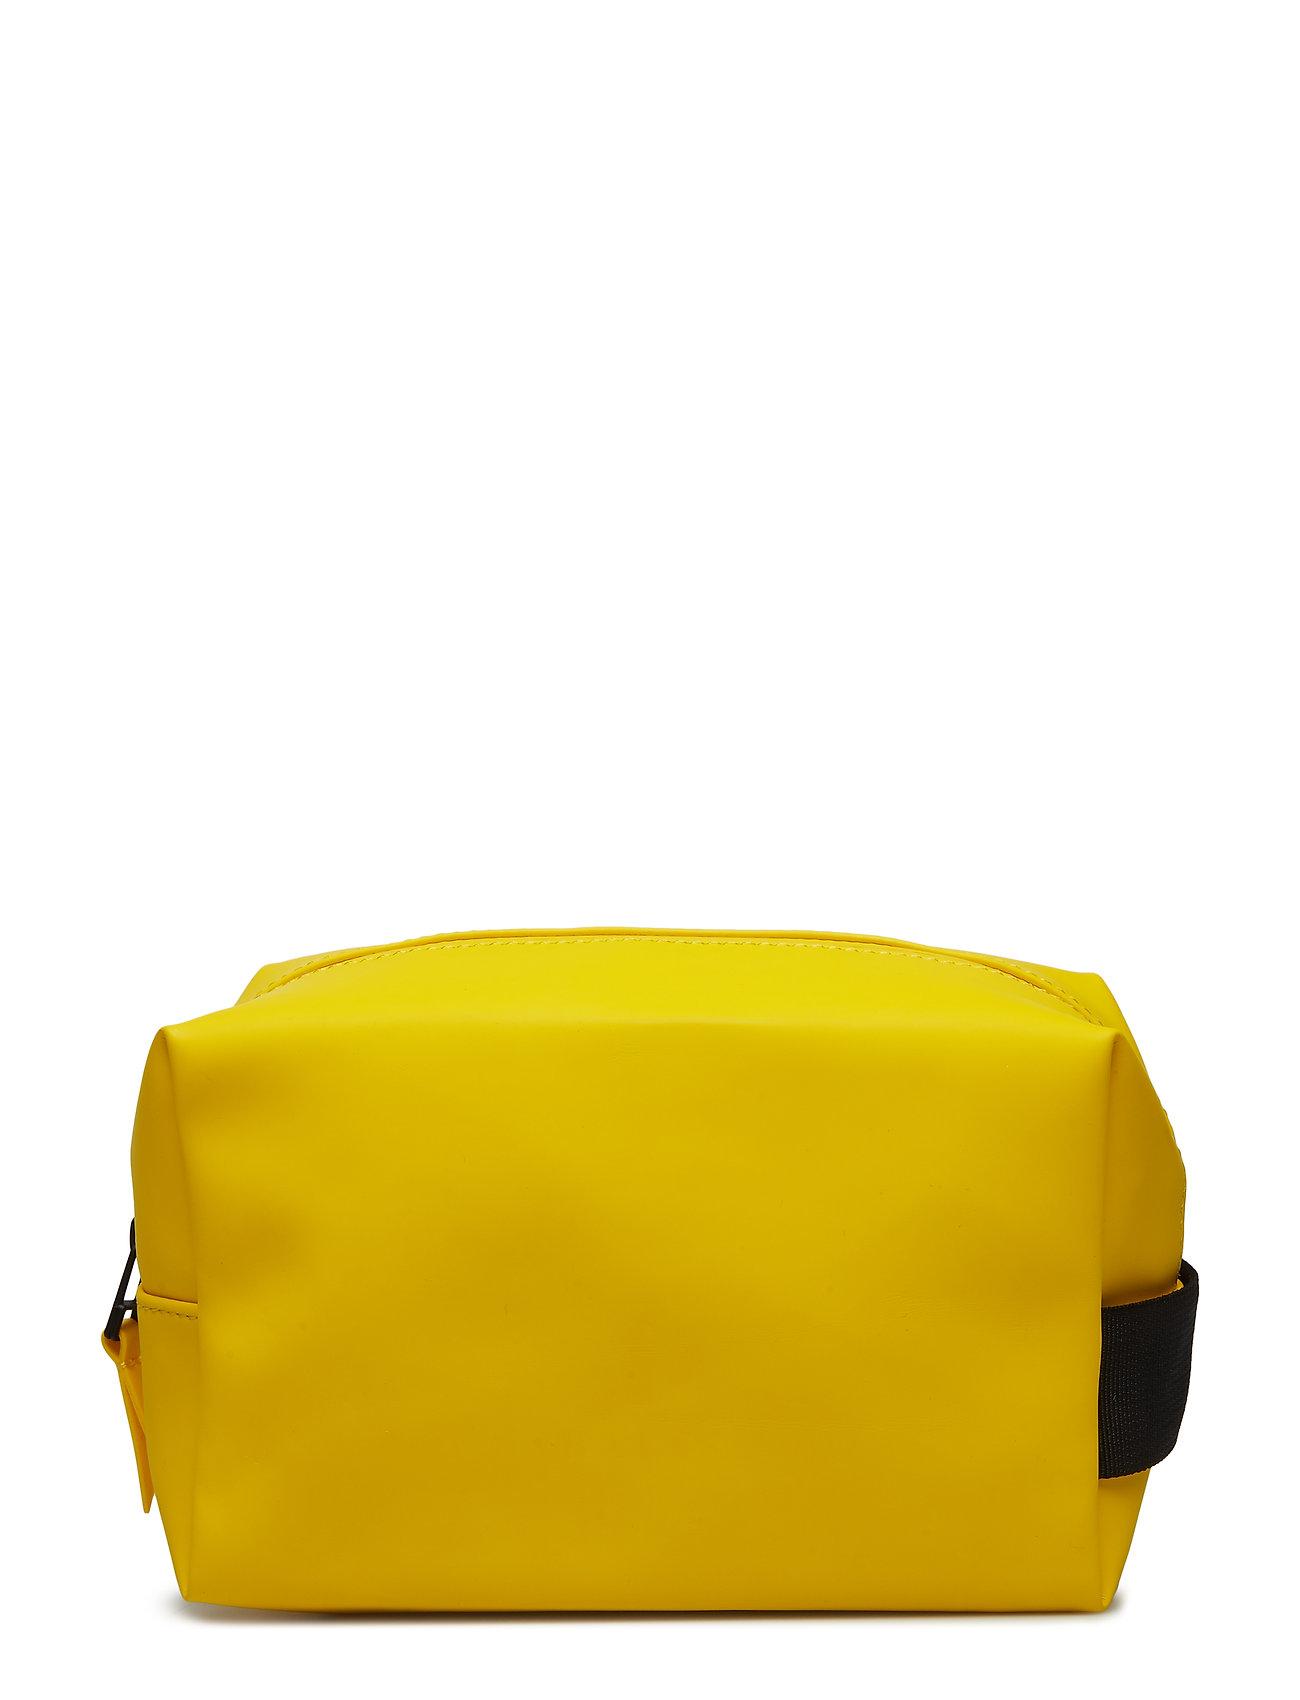 YellowRains Wash Small04 Wash Bag Bag SzMVqpGU